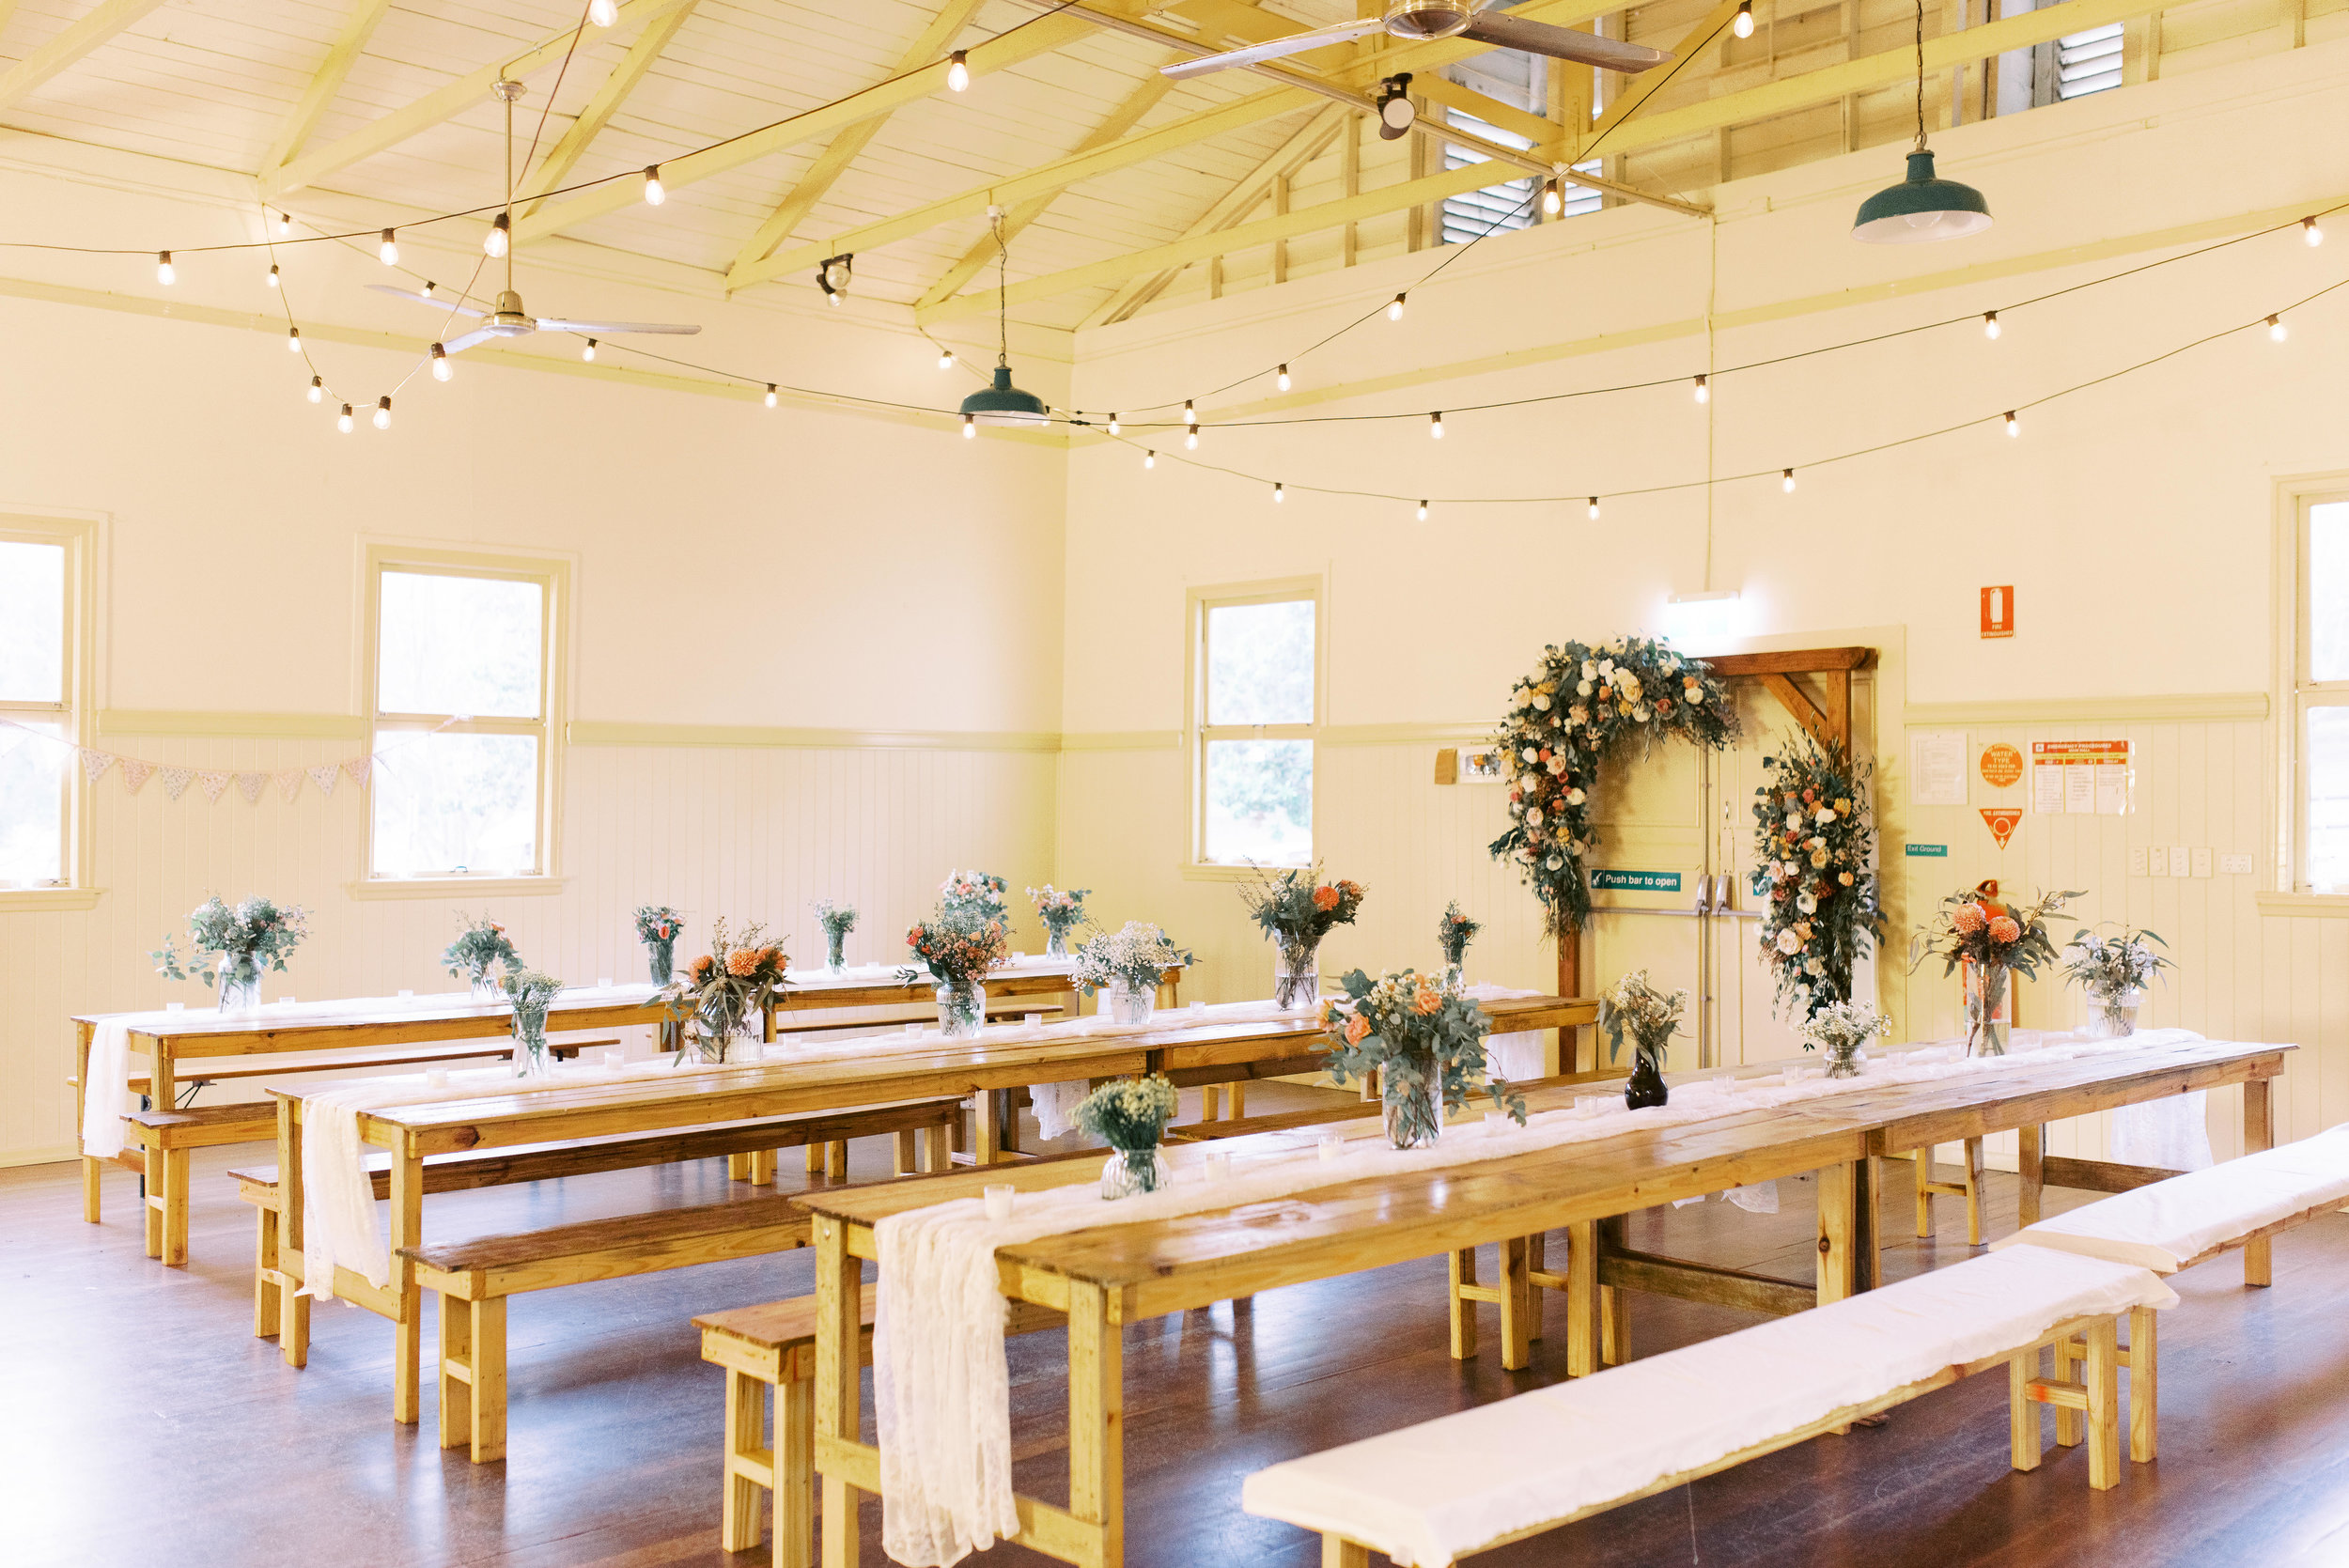 brisbane-gold-coast-sunshine-coast-tweed-romantic-fine-art-wedding-photography-lauren-olivia-51.jpg